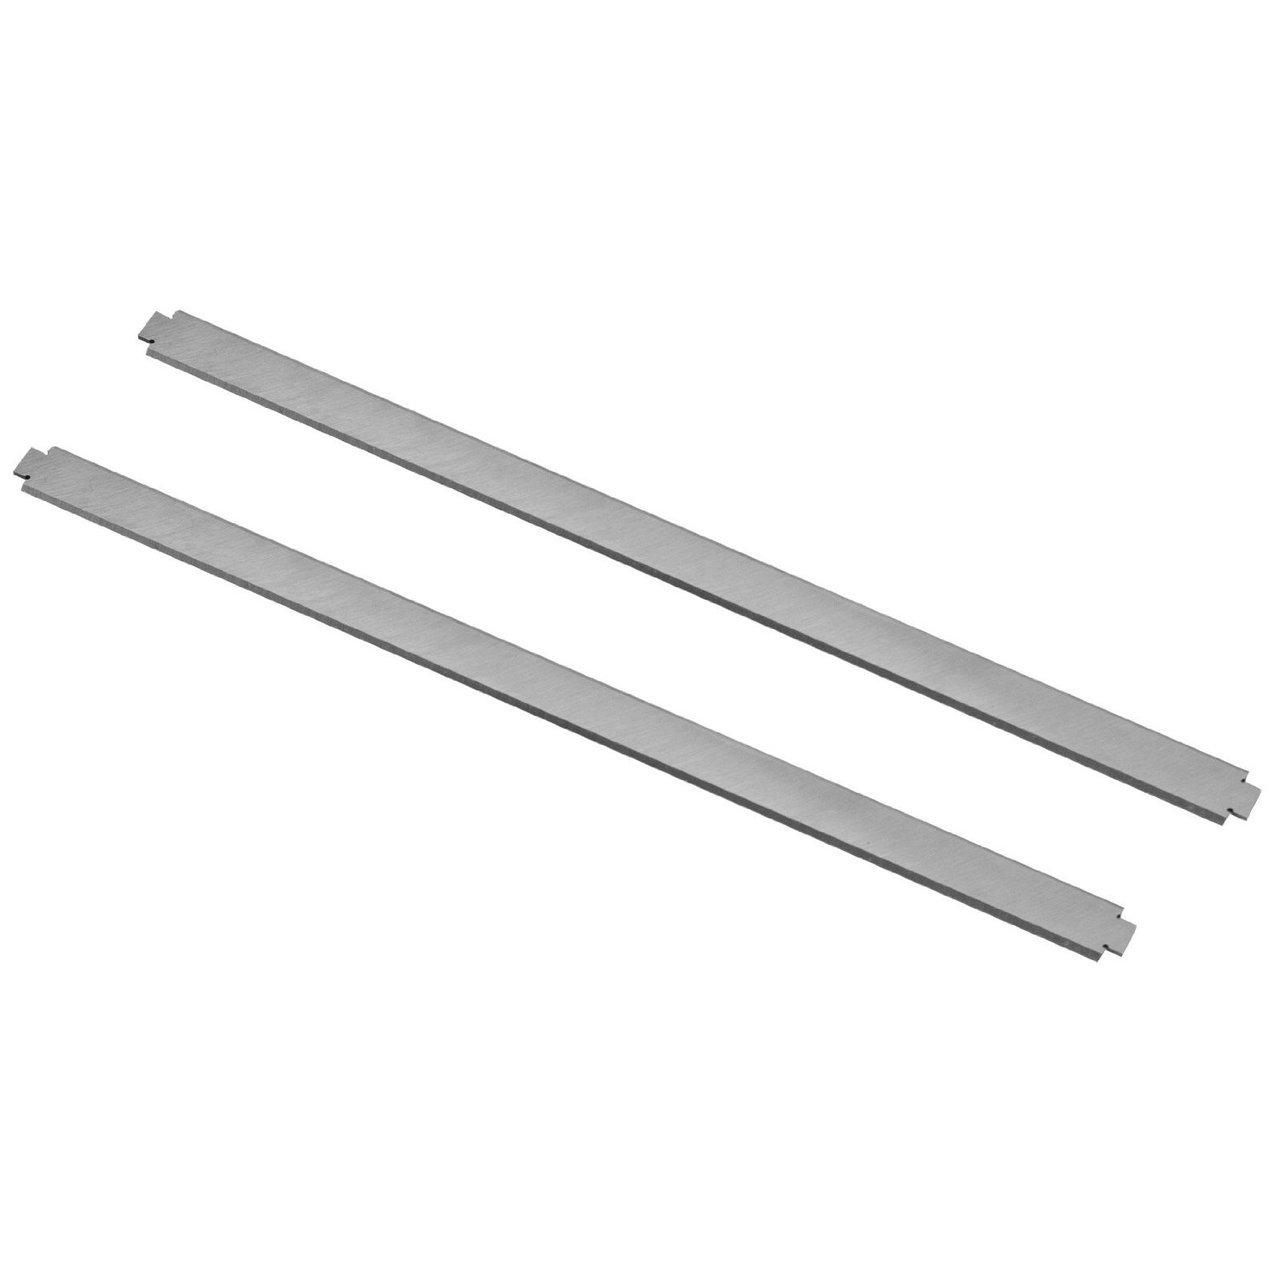 Ridgid AC8630 13-Inch Planer Blades